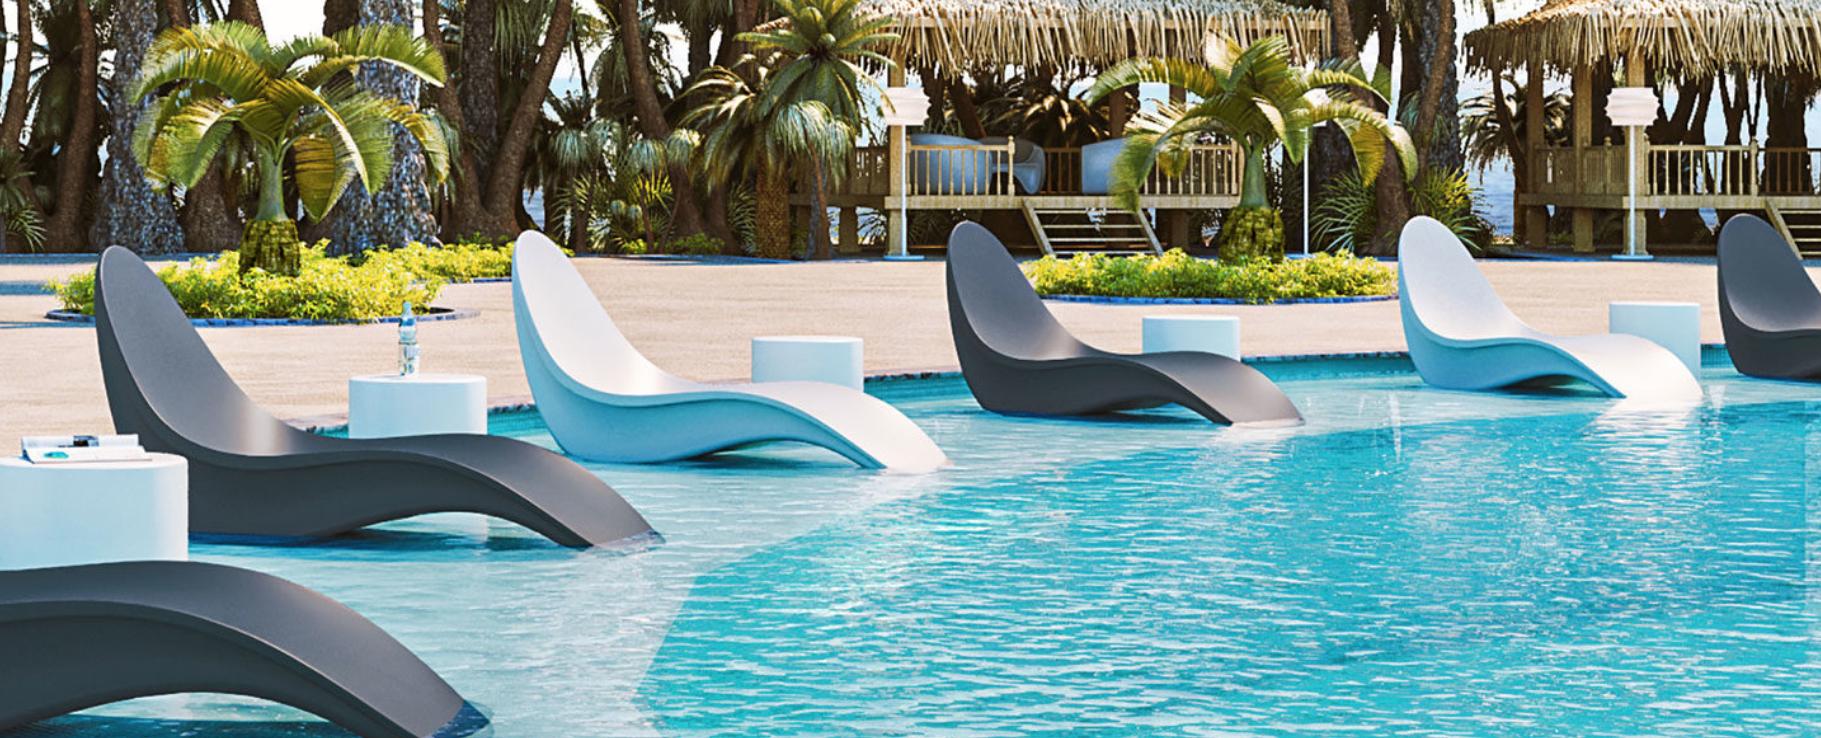 tonik-bikini-chaise on a pool sun shelf